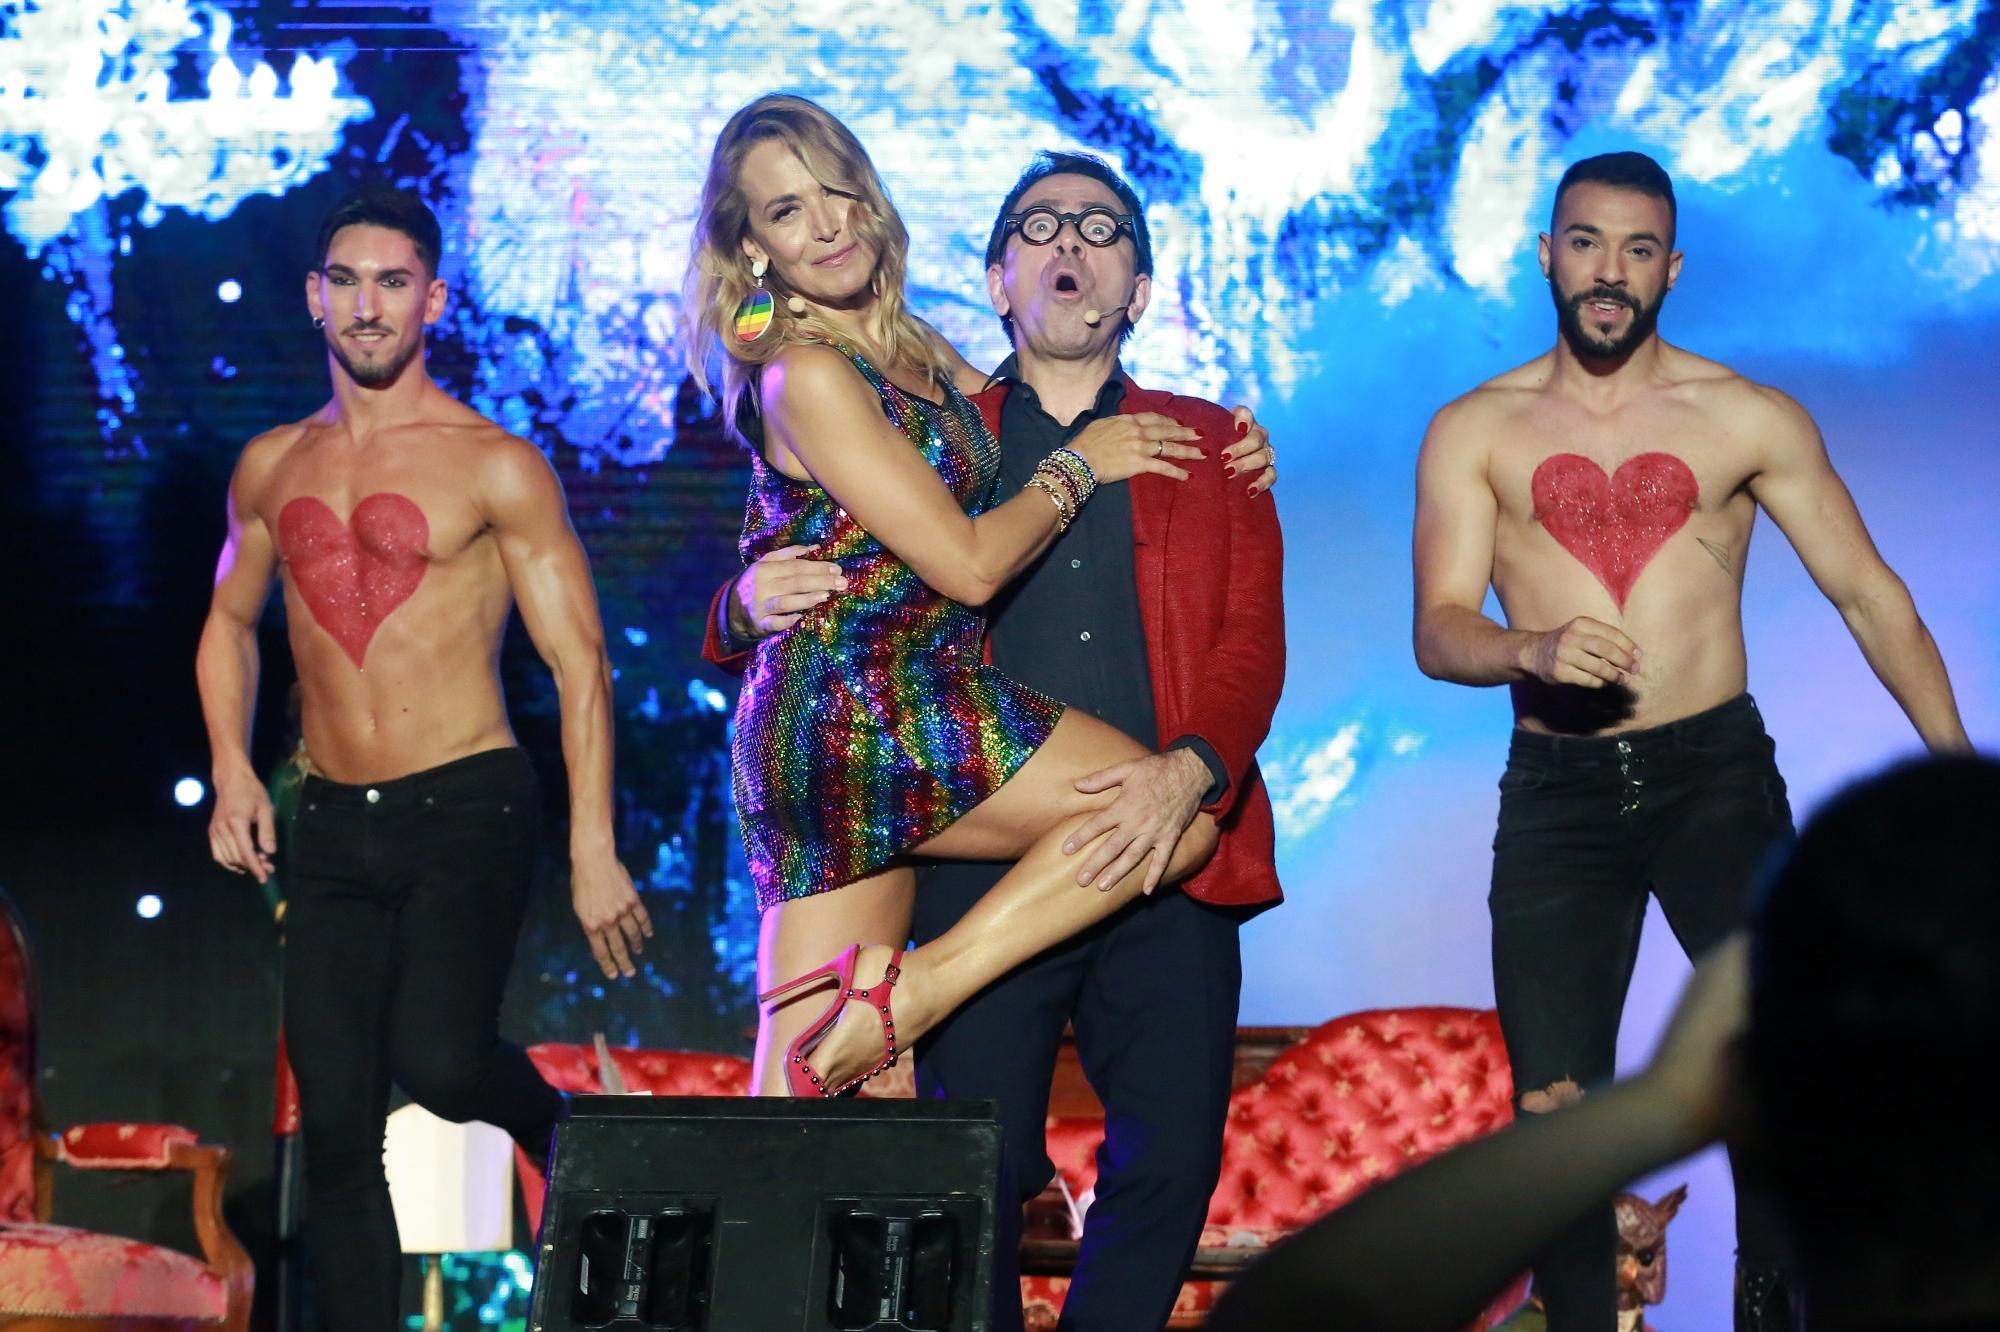 Barbara D'Urso scatenata al Gay Village: si racconta e balla